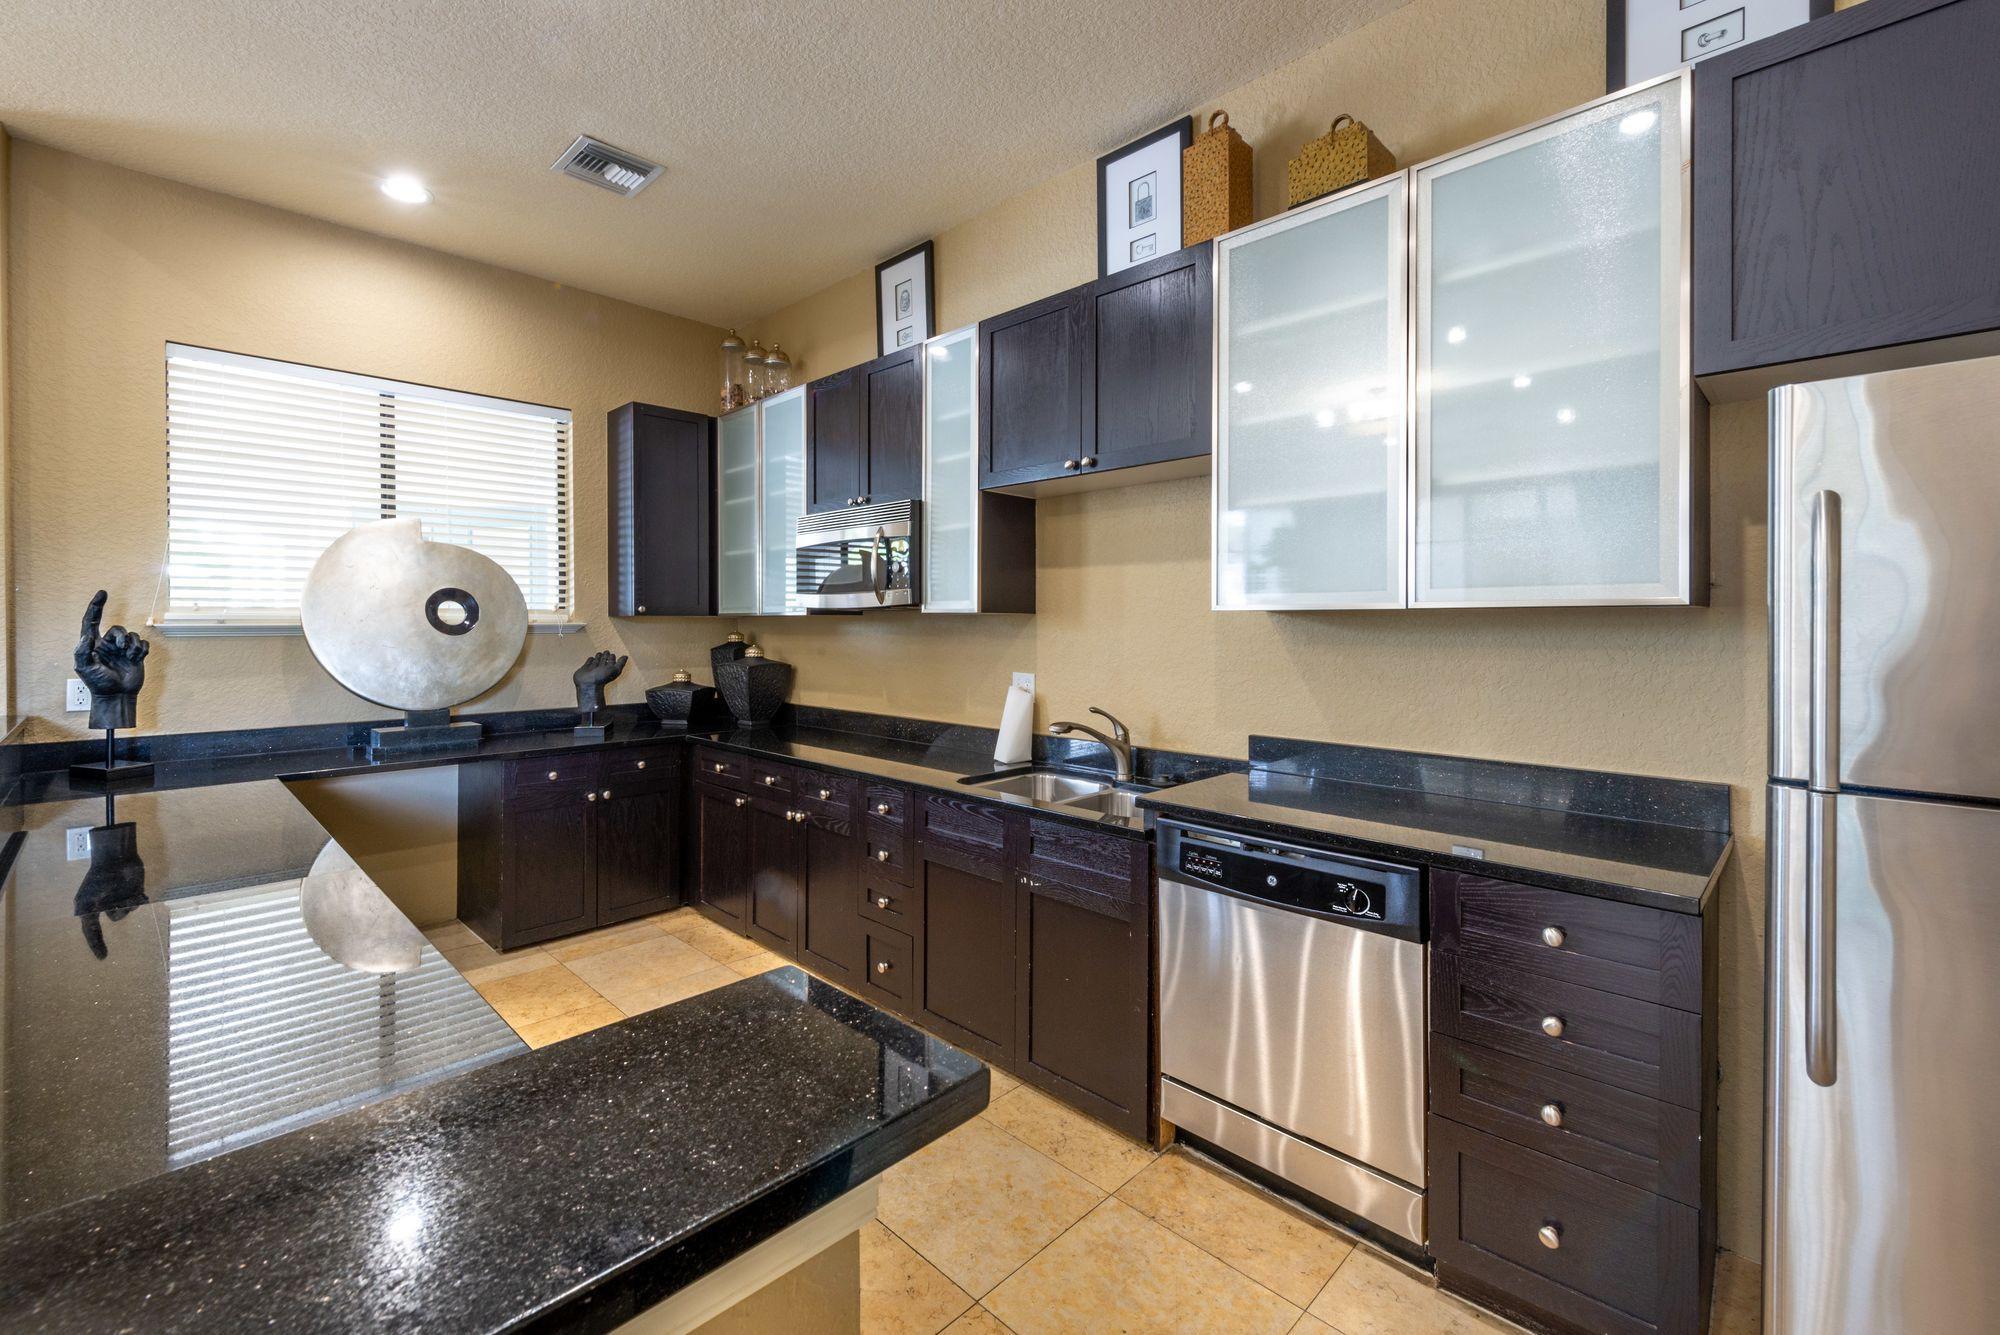 Apartments Near JU Mirador for Jacksonville University Students in Jacksonville, FL